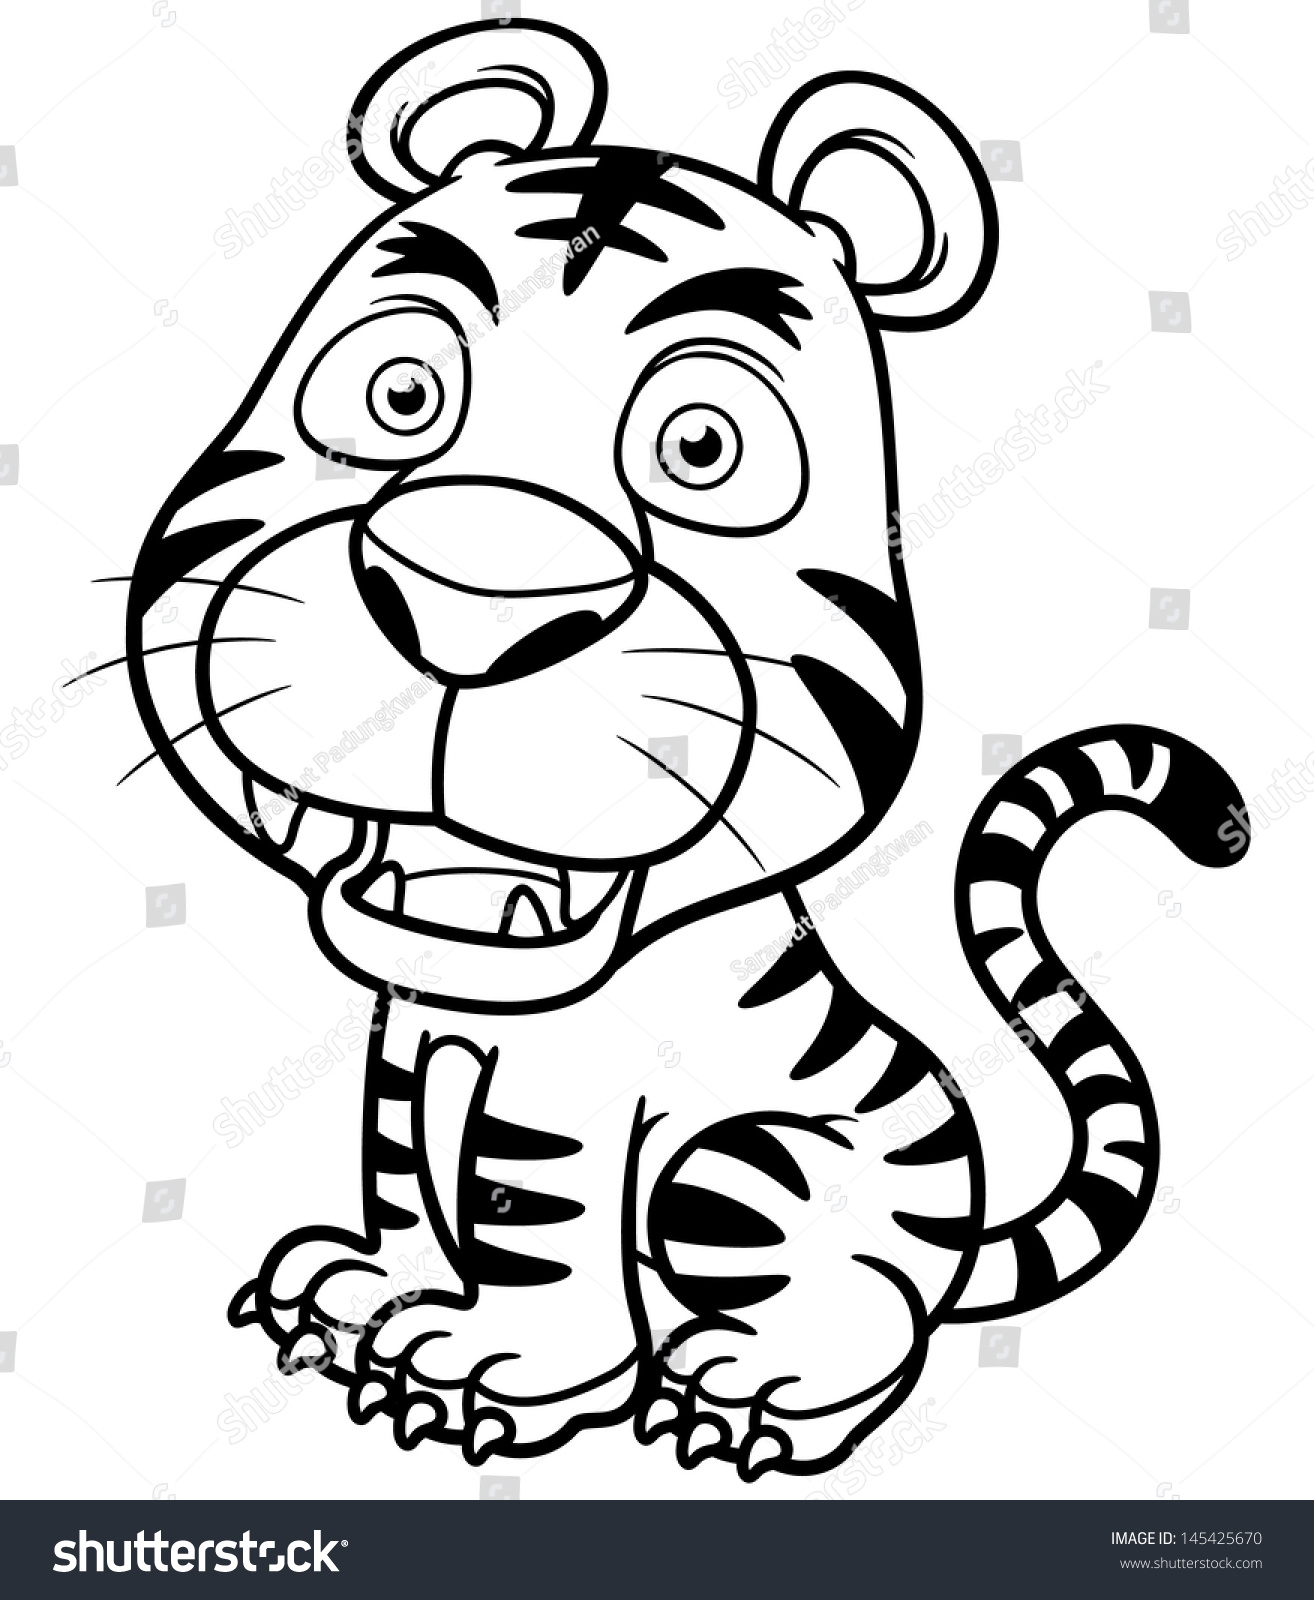 Vector Illustration Tiger Cartoon Coloring Book Stock Vector